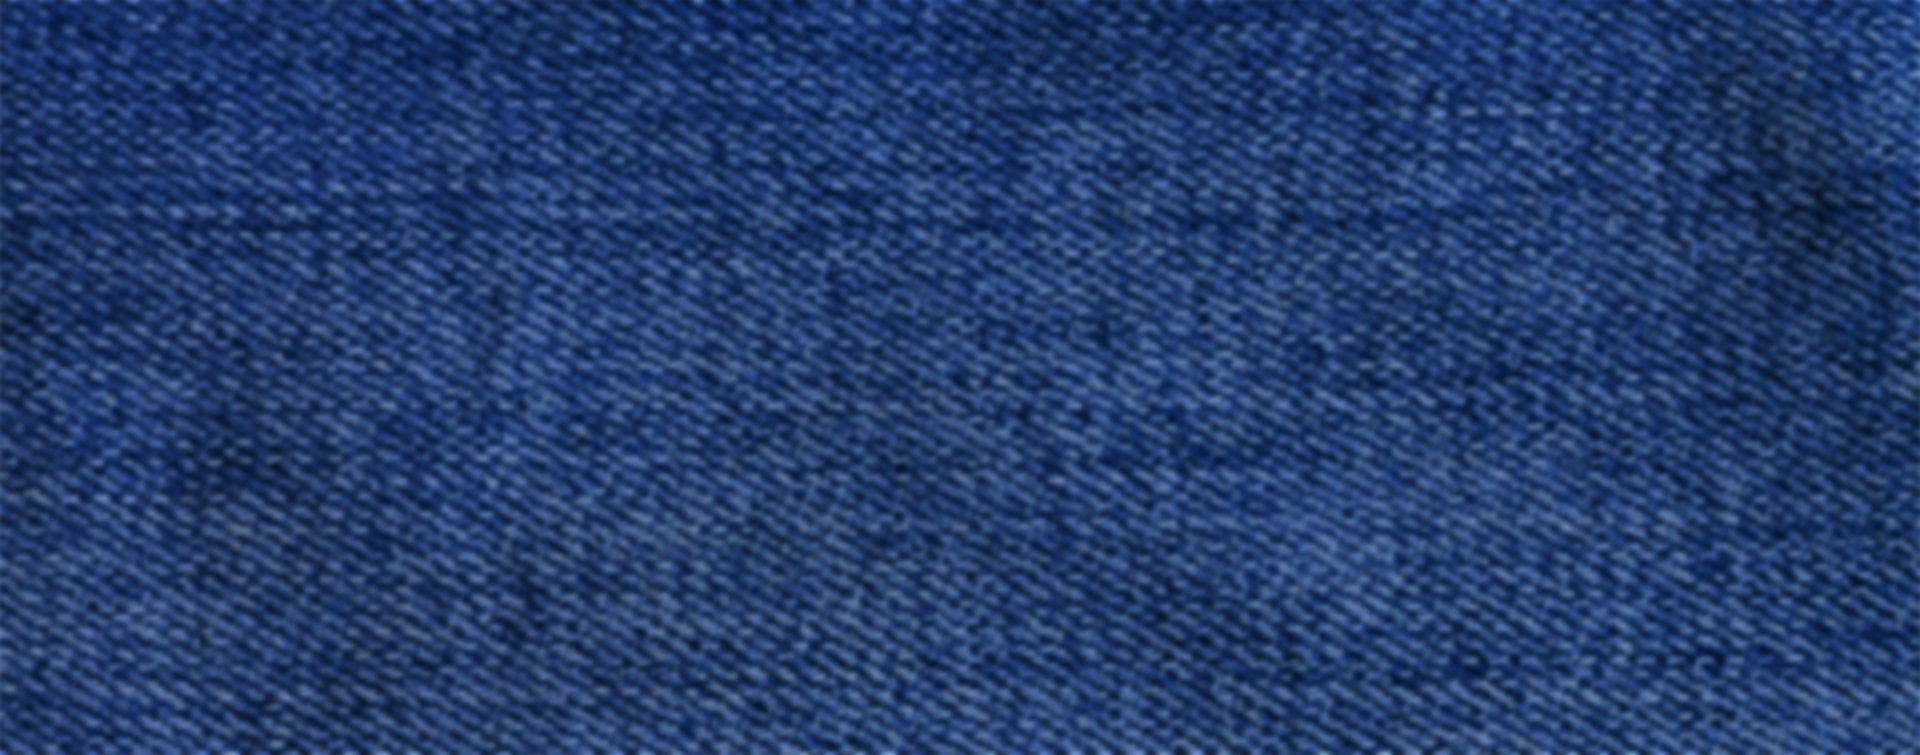 denim22-fabric-close-up-PH7JVT4.jpg